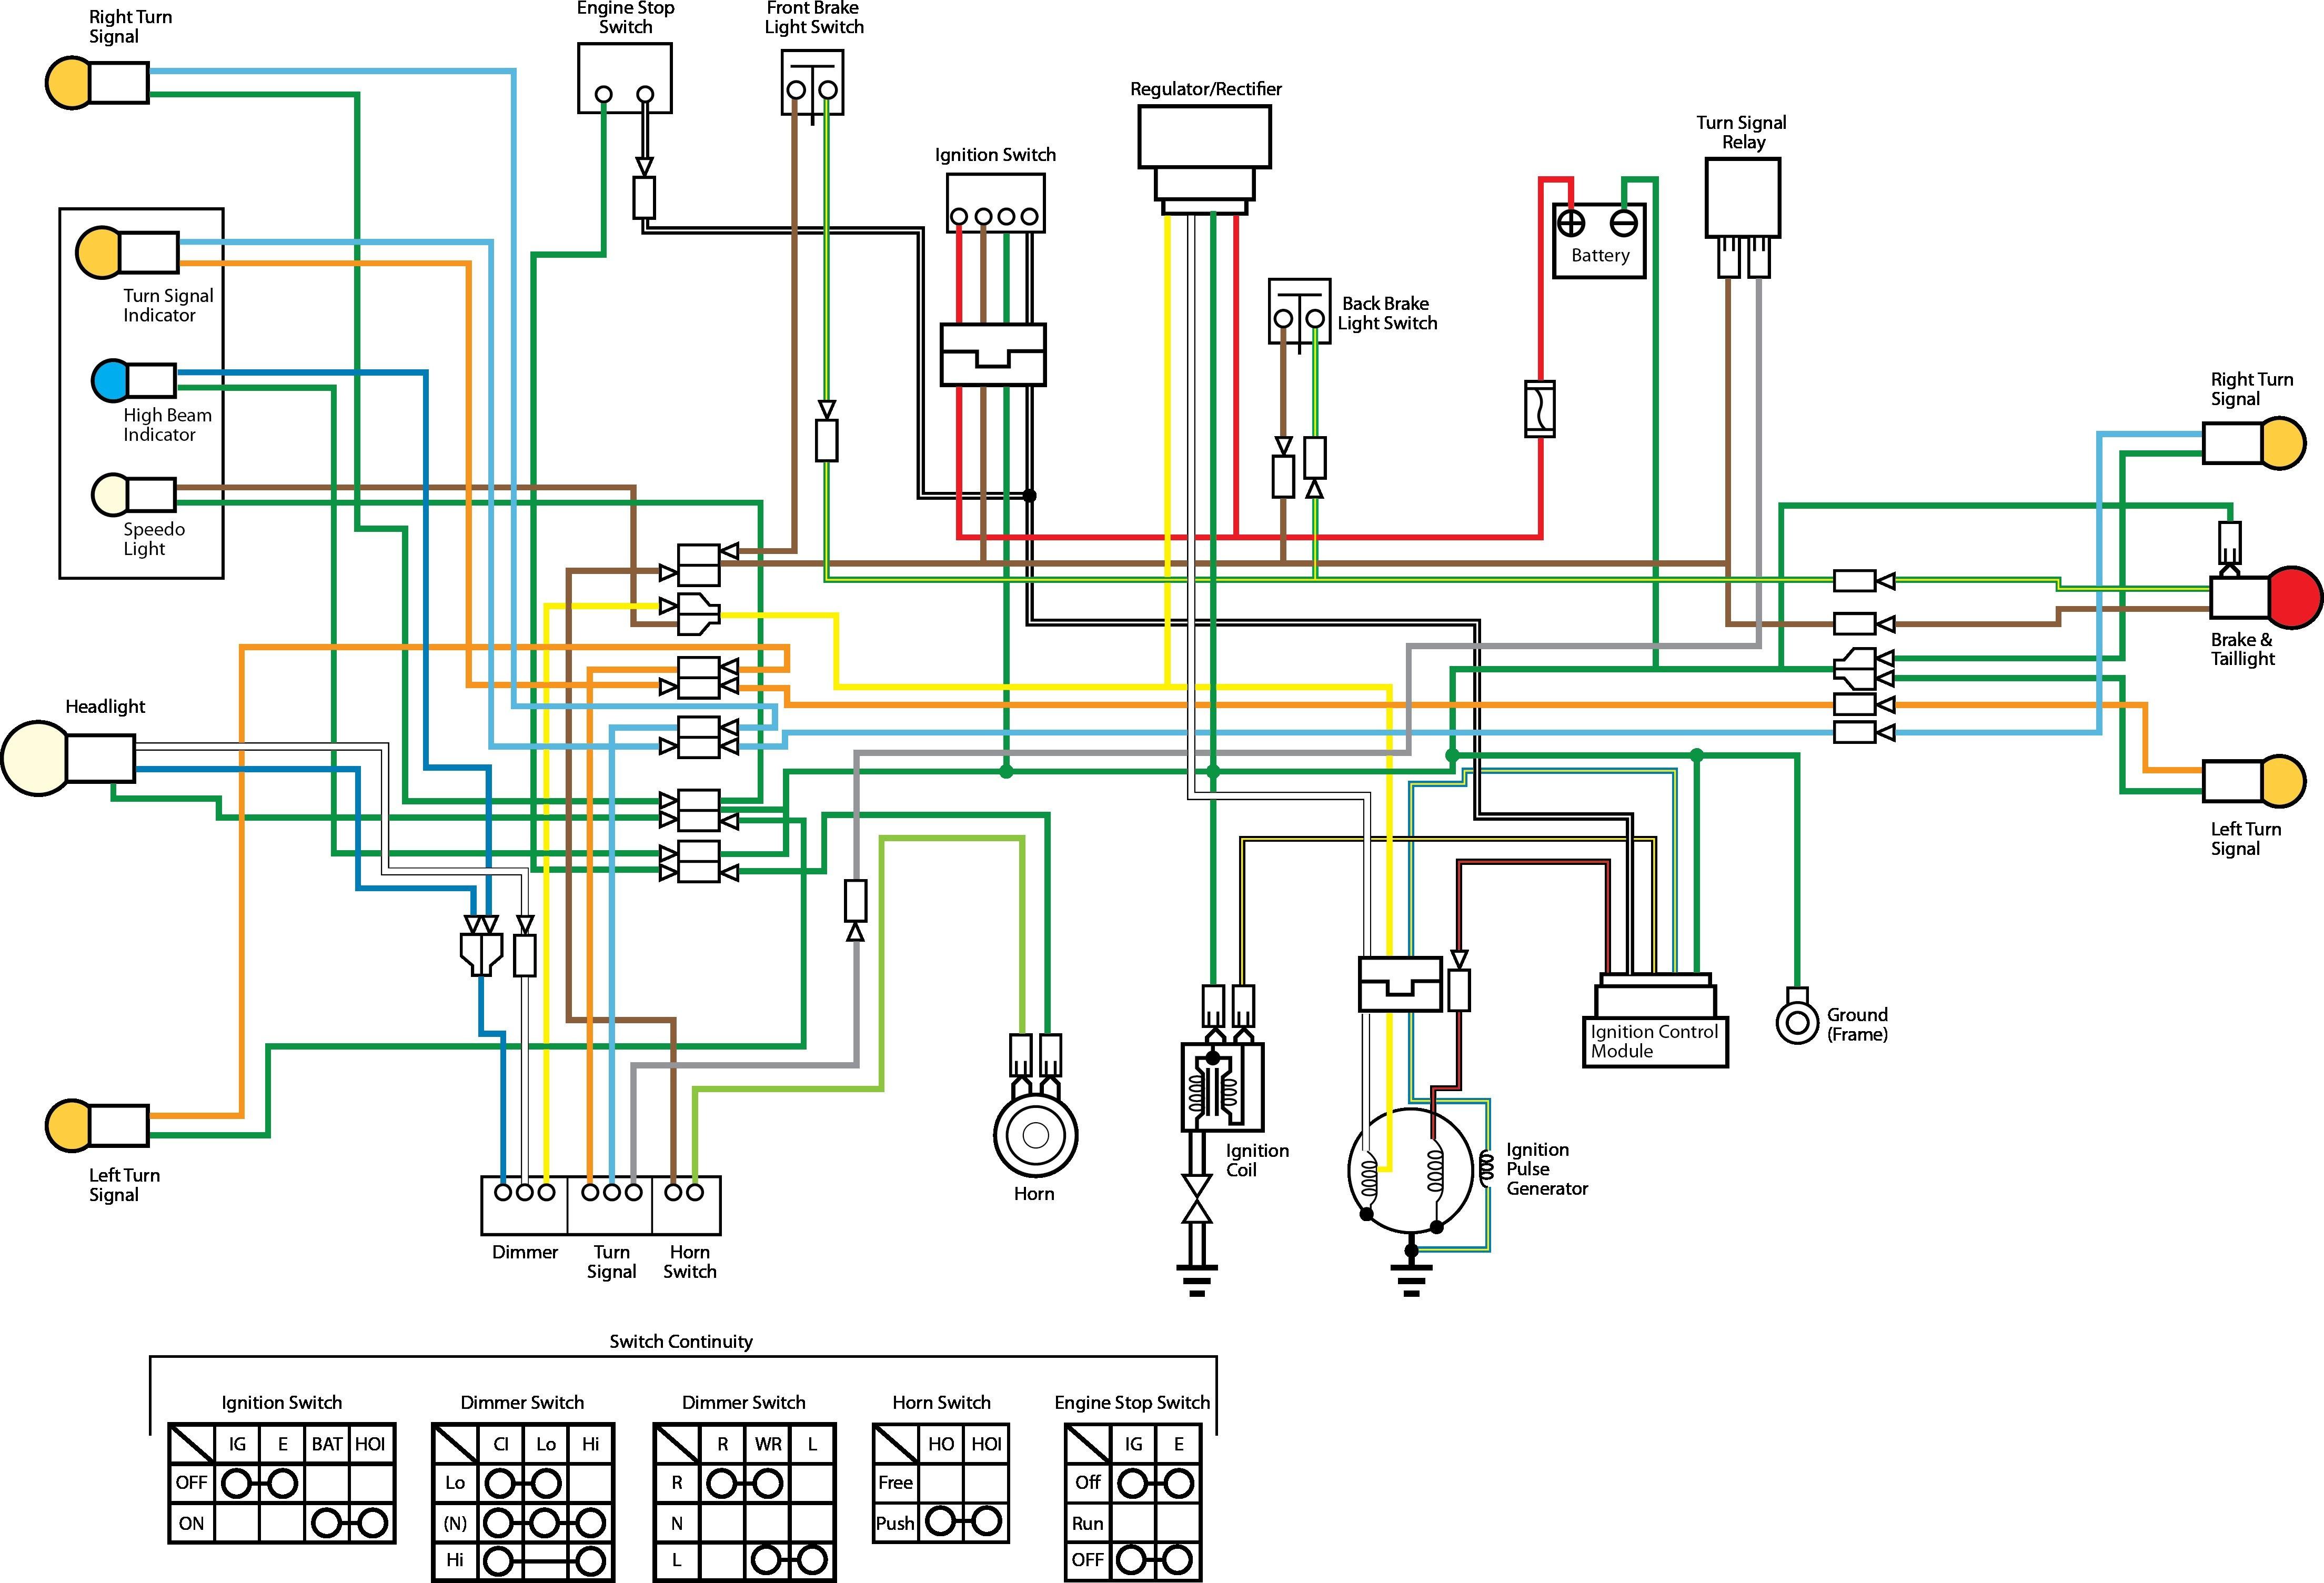 Maruti Suzuki 800 Engine Diagram Mtd Electrical Diagram Of Maruti Suzuki 800 Engine Diagram